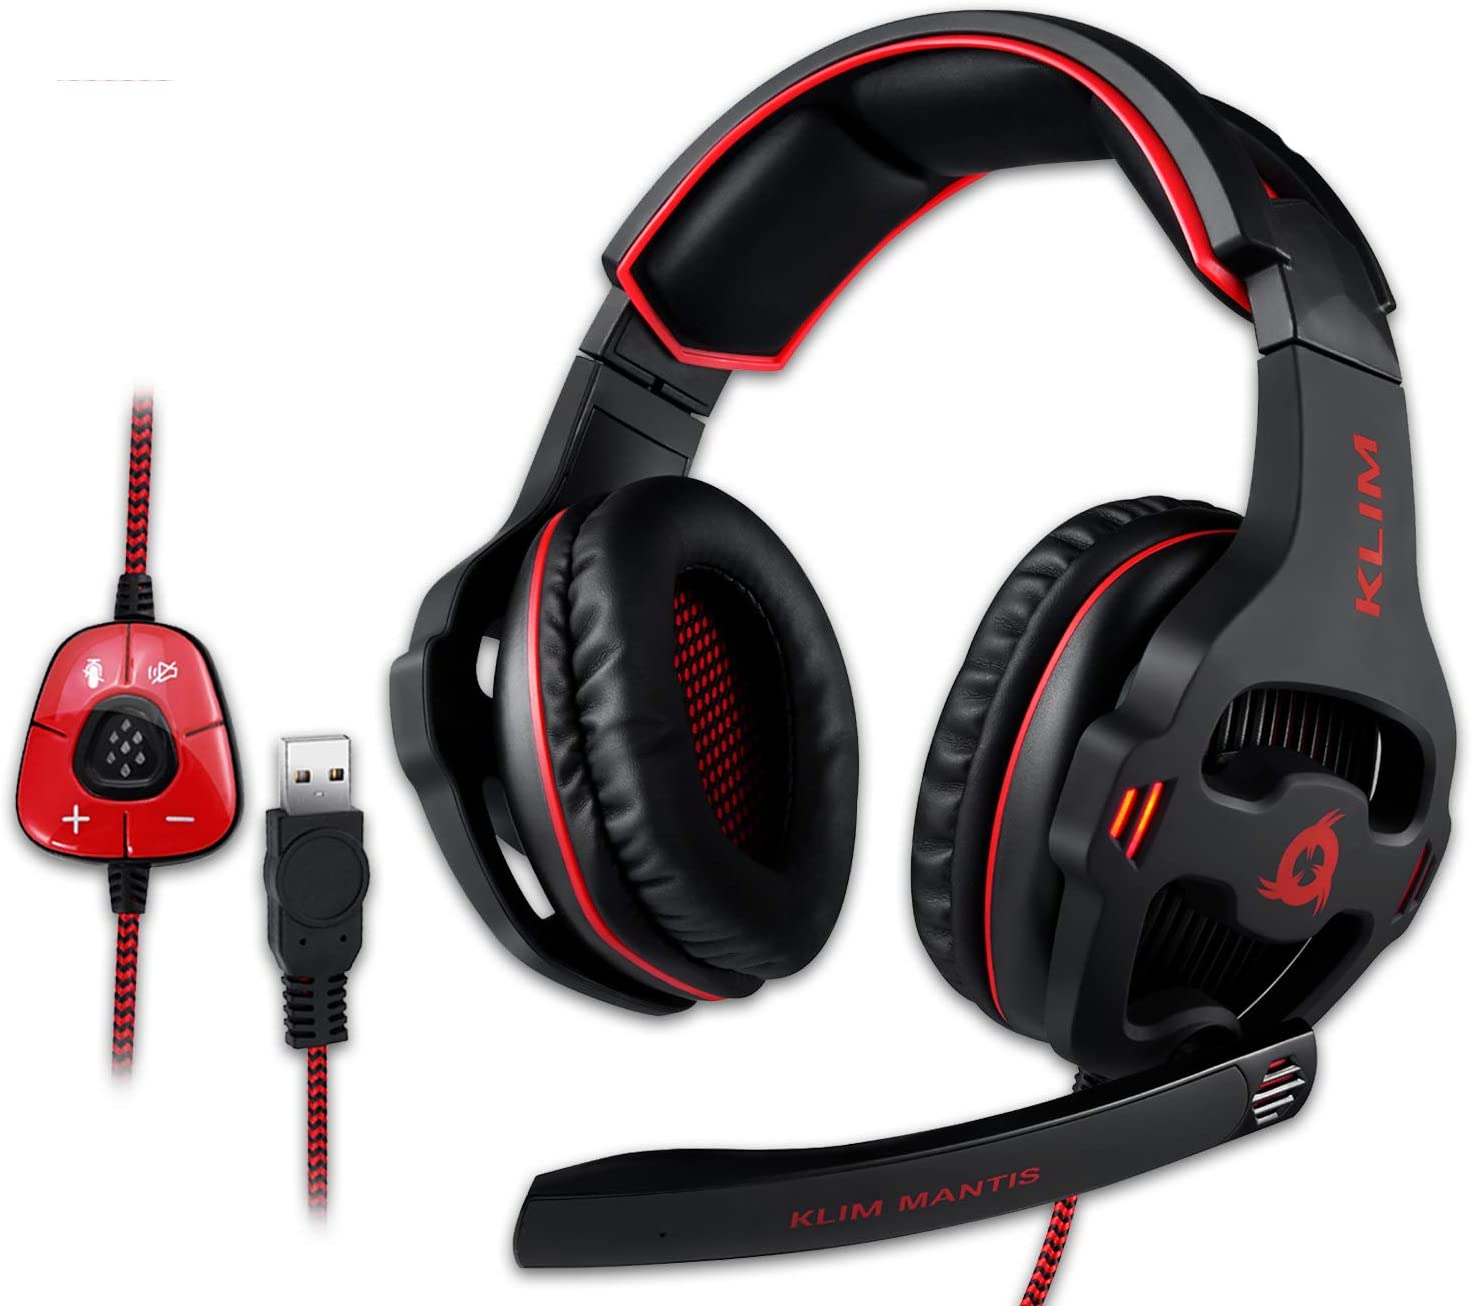 KLIM™ Mantis - Cascos Gaming con micrófono - Auriculares USB para PC, PS4, Nintendo Switch, Mac + Sonido Envolvente 7.1 con cancelación de Ruido pasiva + NUEVOS 2020